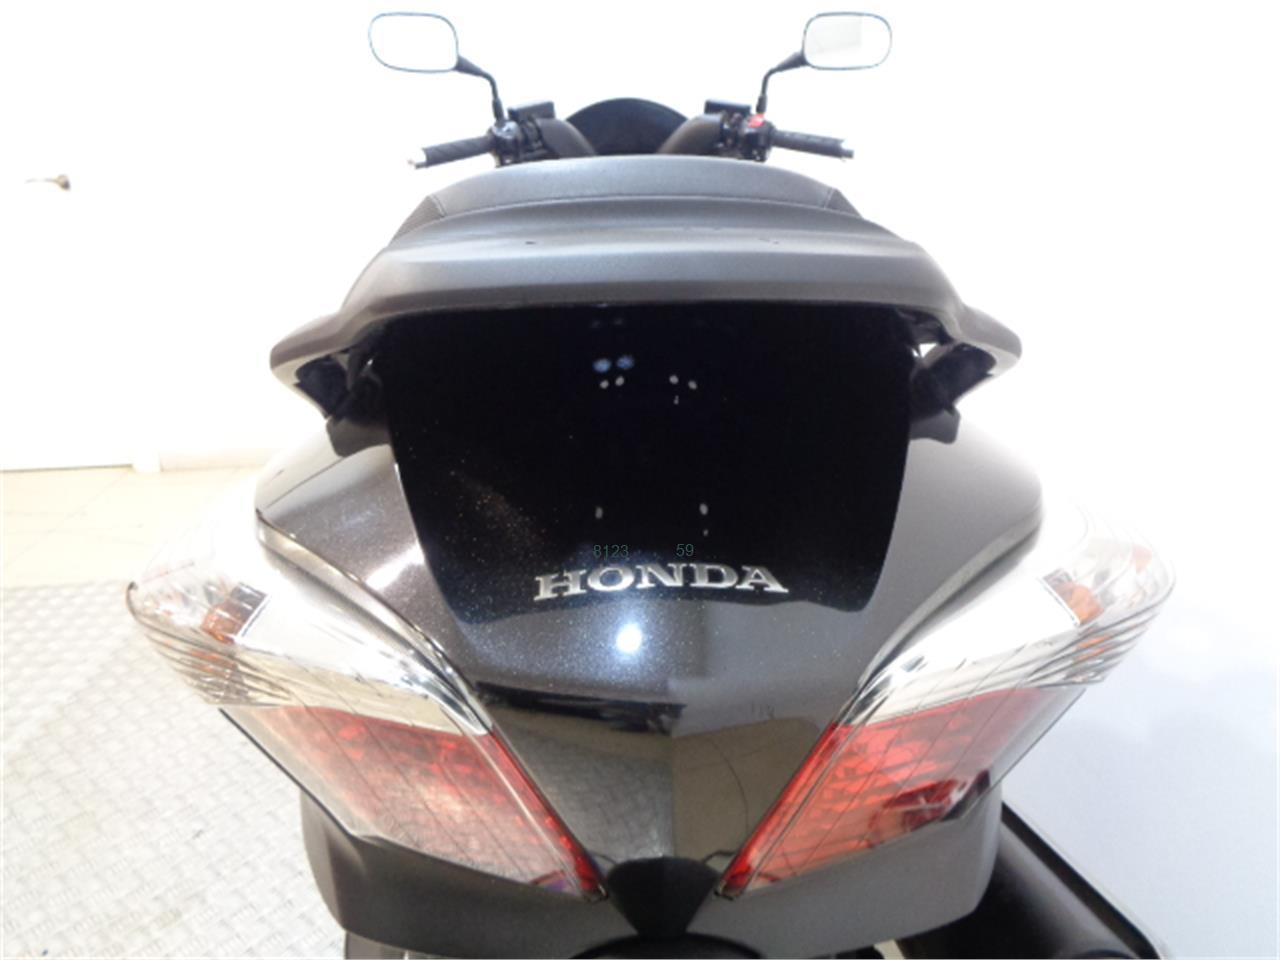 HONDA SW T400 ABS_2 de venta en Málaga